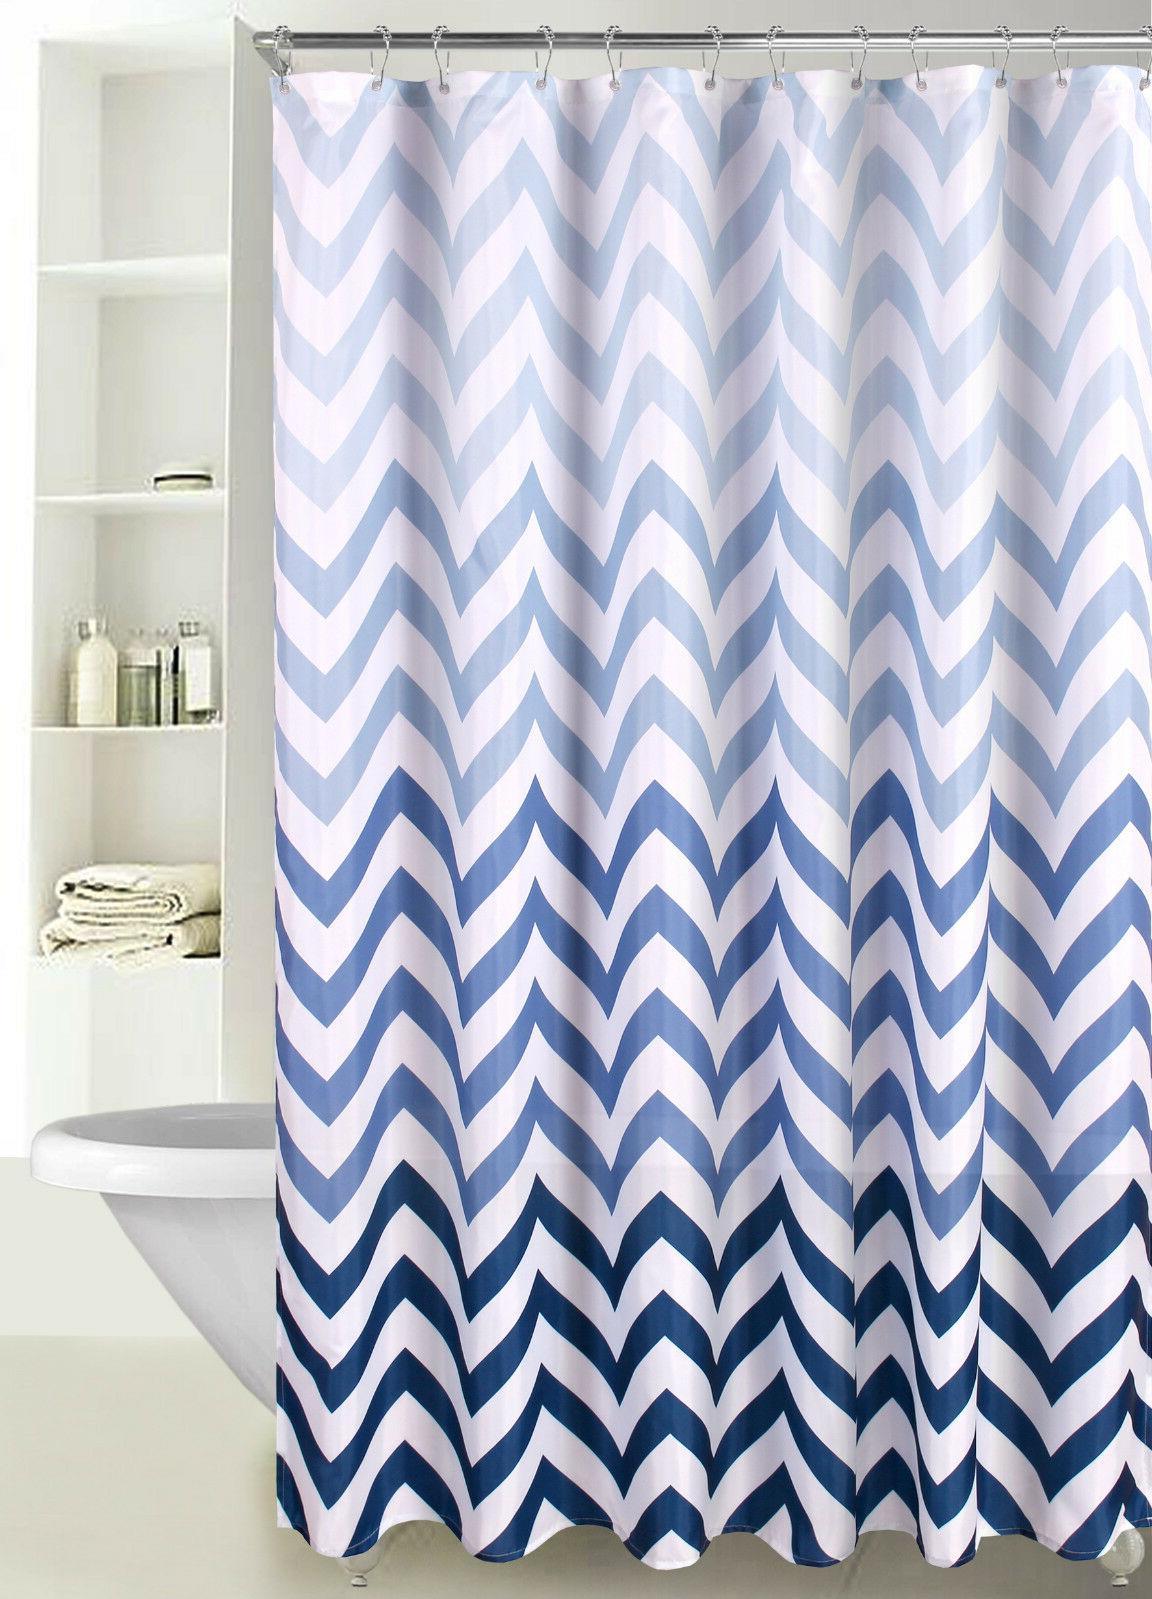 fabric shower curtain ombre zig zag chevron